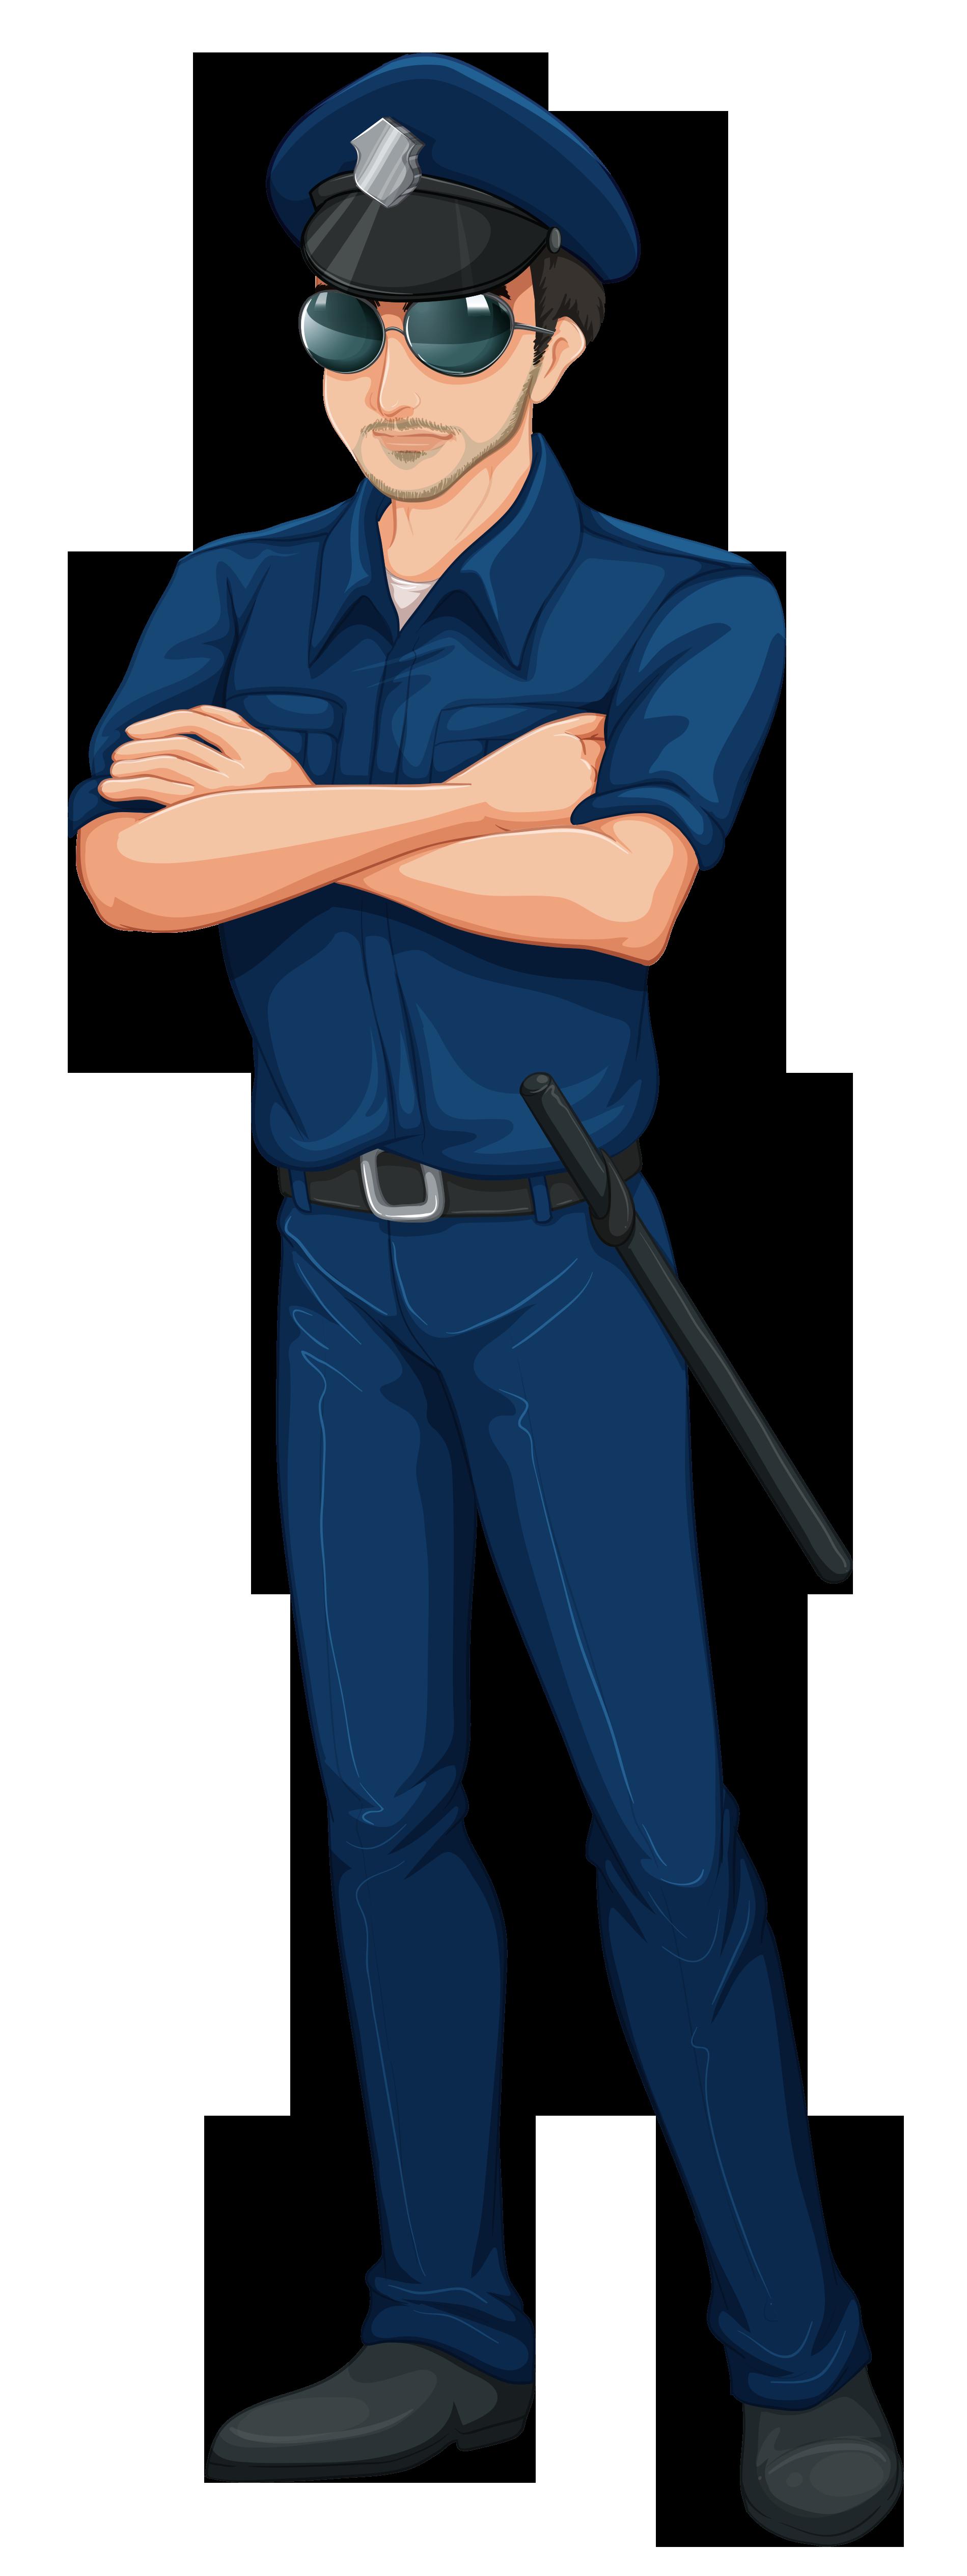 Cop Policeman PNG Clip Art Image.